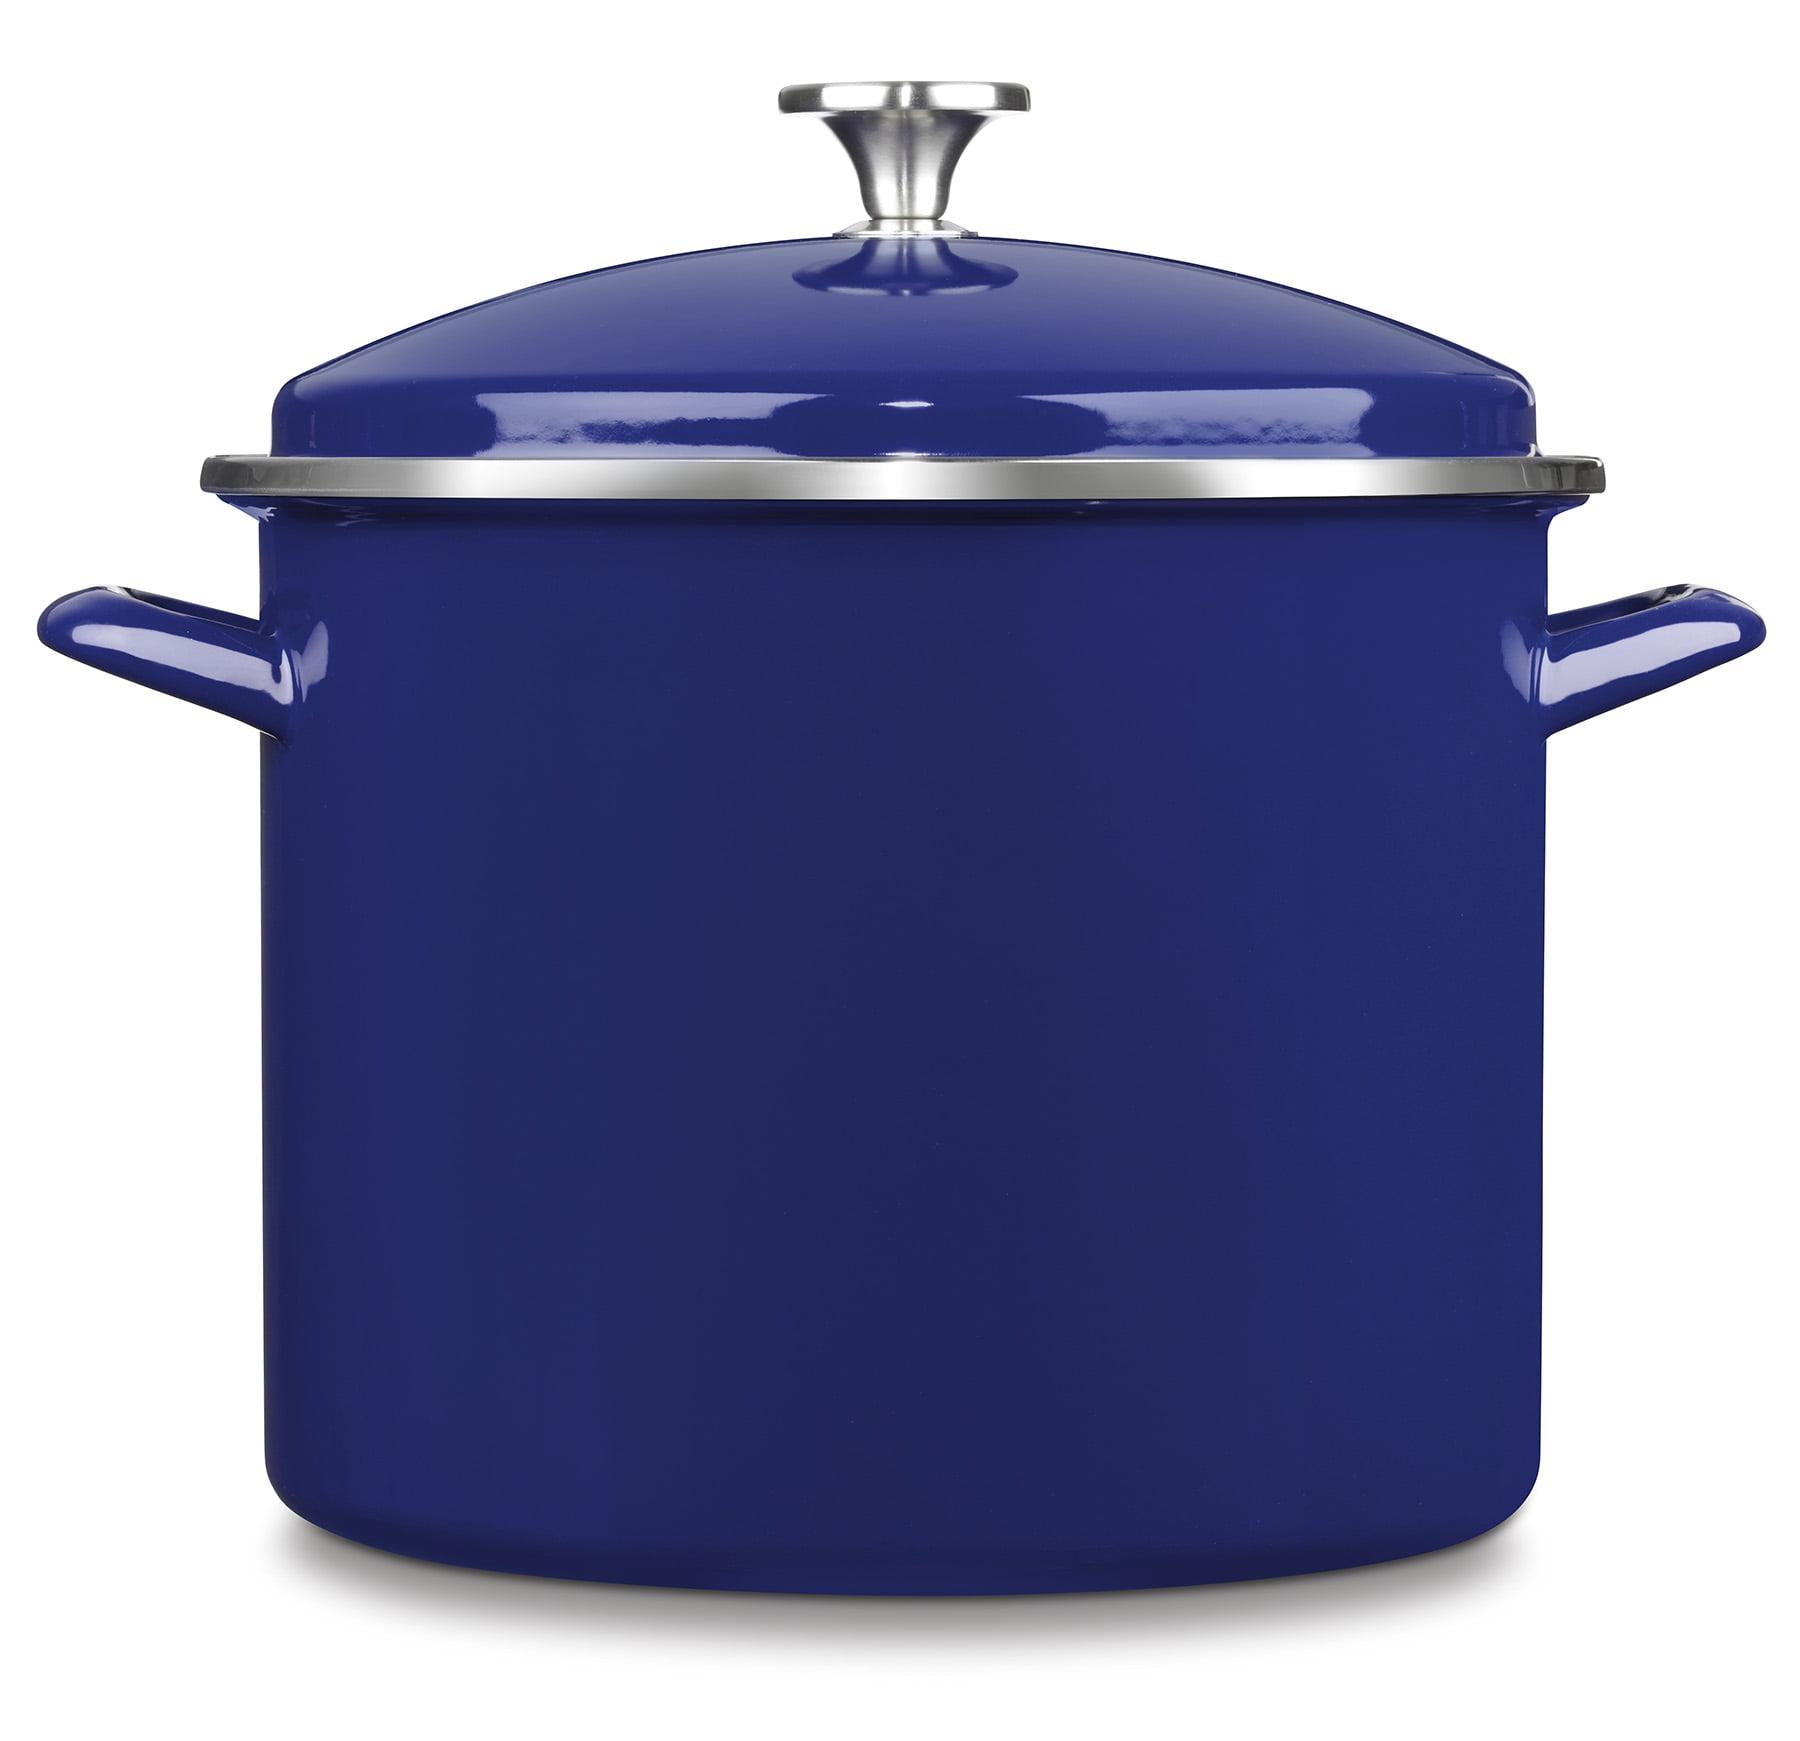 Cuisinart Chef'S Classic Enamel On Steel 12 Qt. Stockpot W/Cover - Cobalt Blue